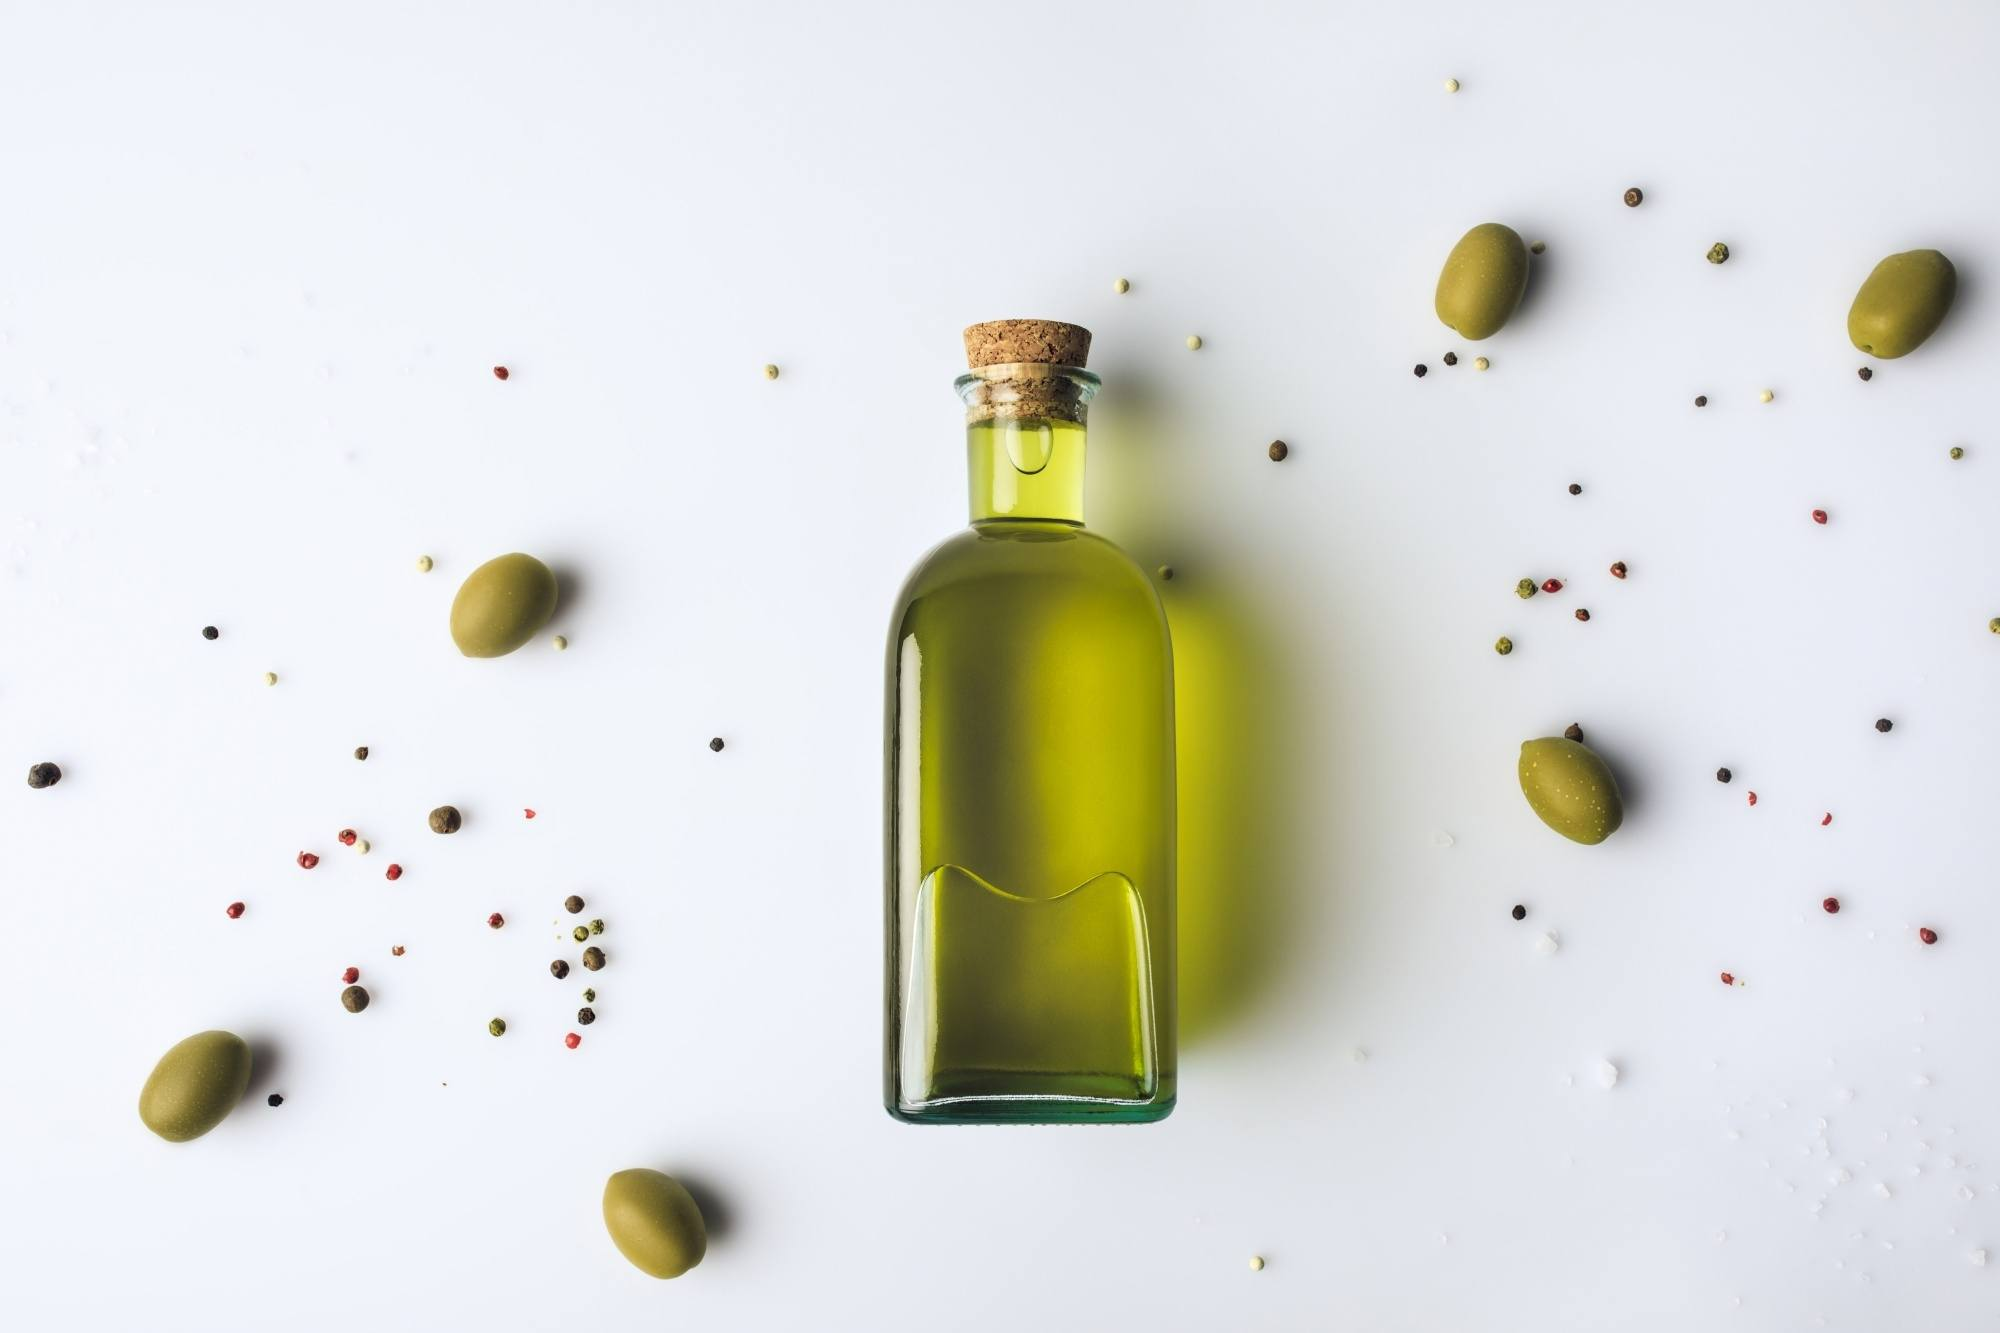 Natural dandruff remedies: a bottle of olive oil